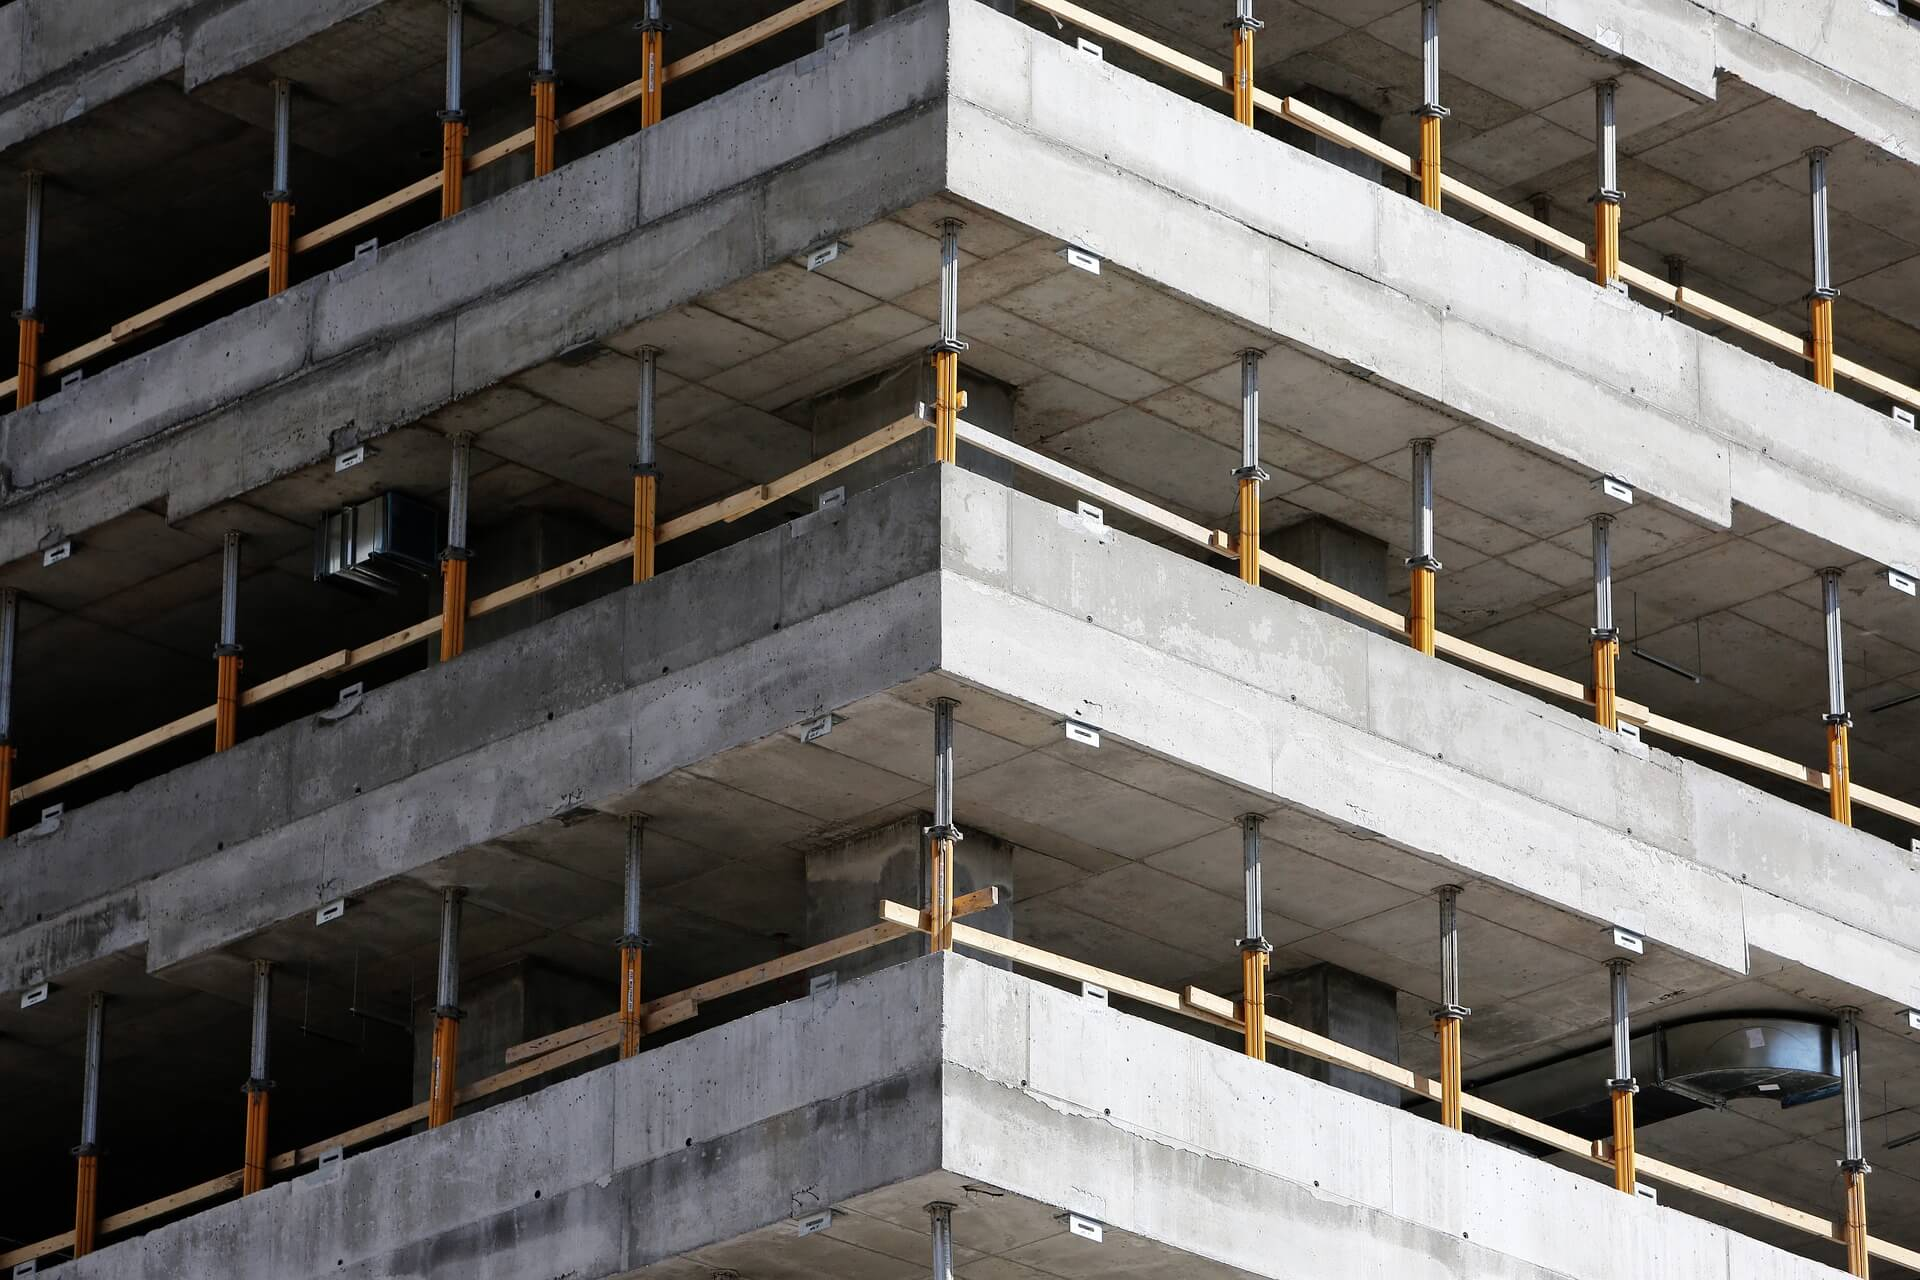 building-926001_1920